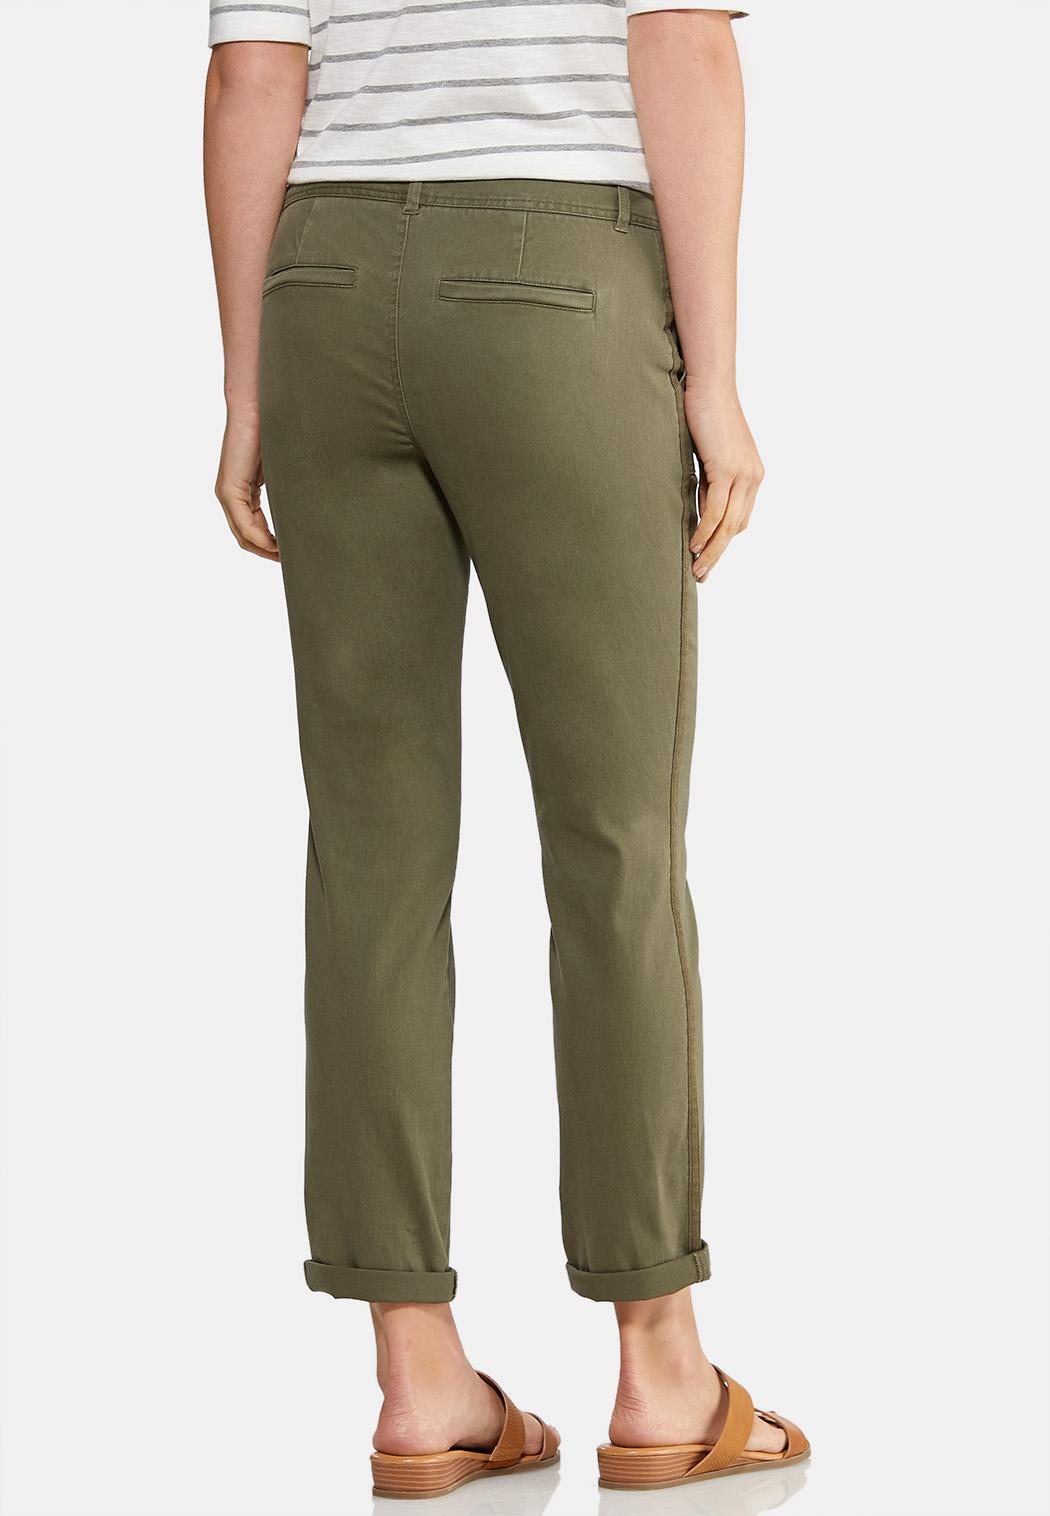 Utility Chino Pants (Item #43901656)